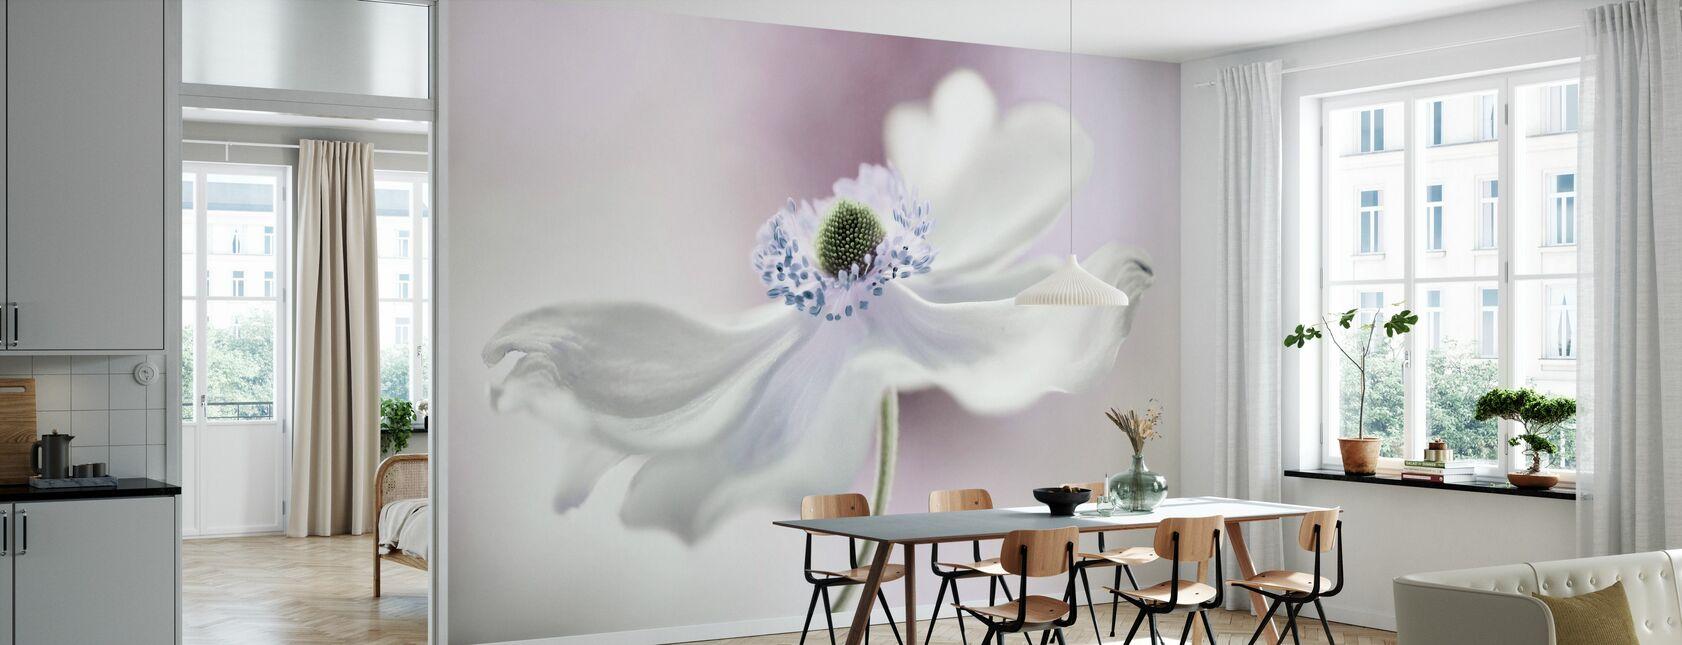 Anemone Breeze - Wallpaper - Kitchen